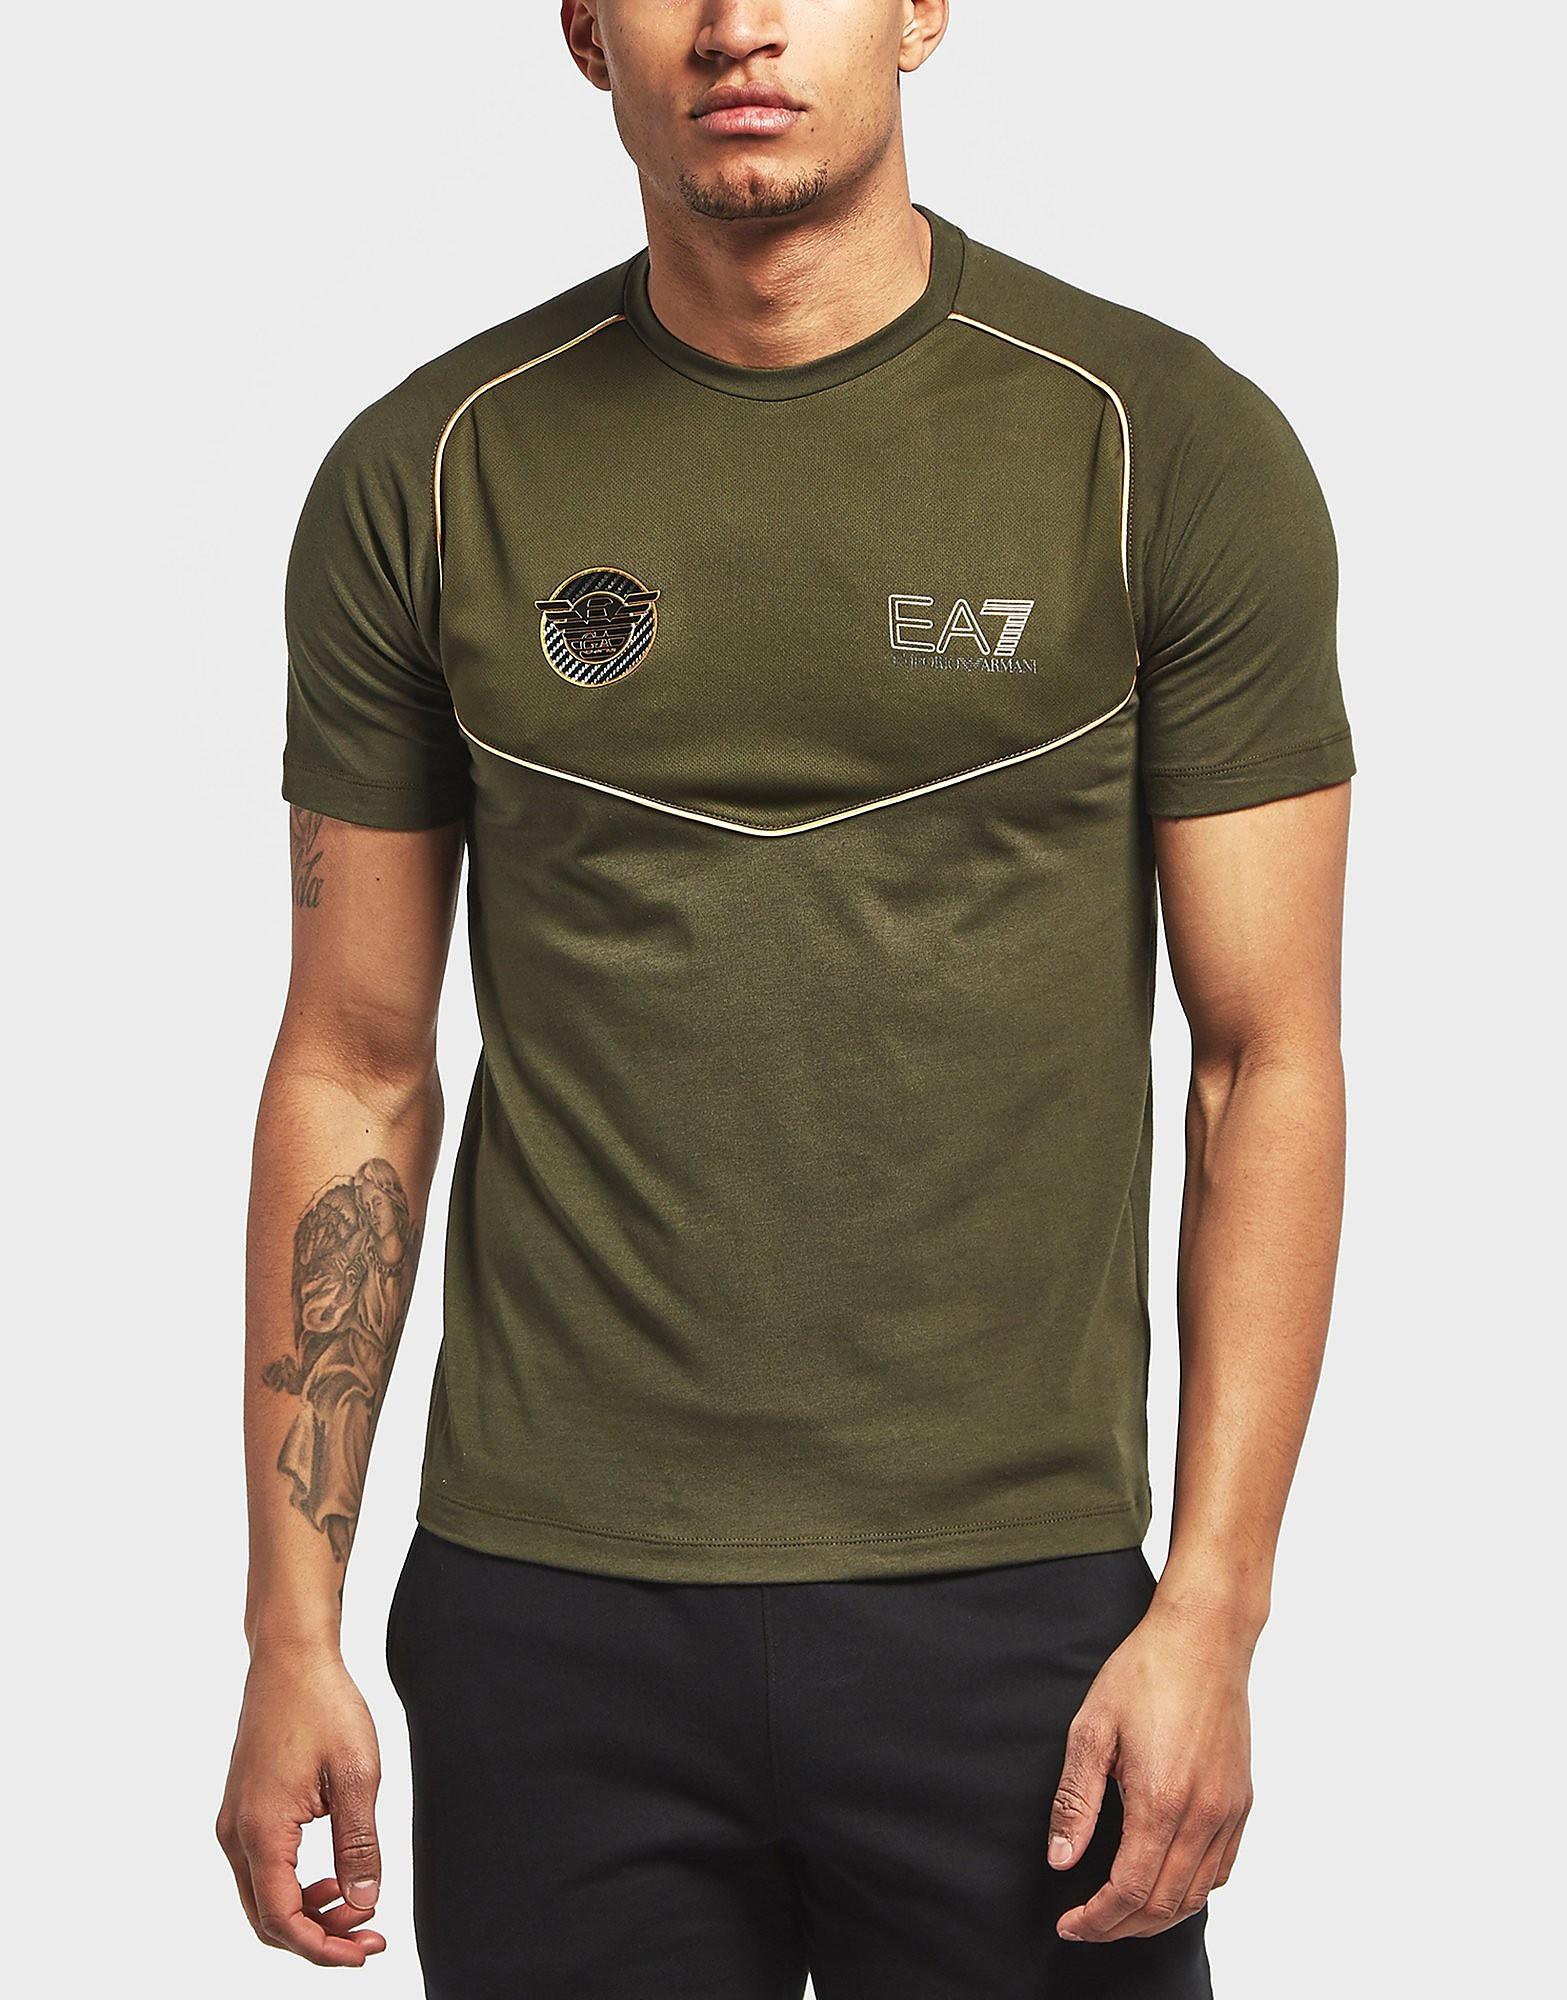 Emporio Armani EA7 Soccer Crew Short Sleeve T-Shirt